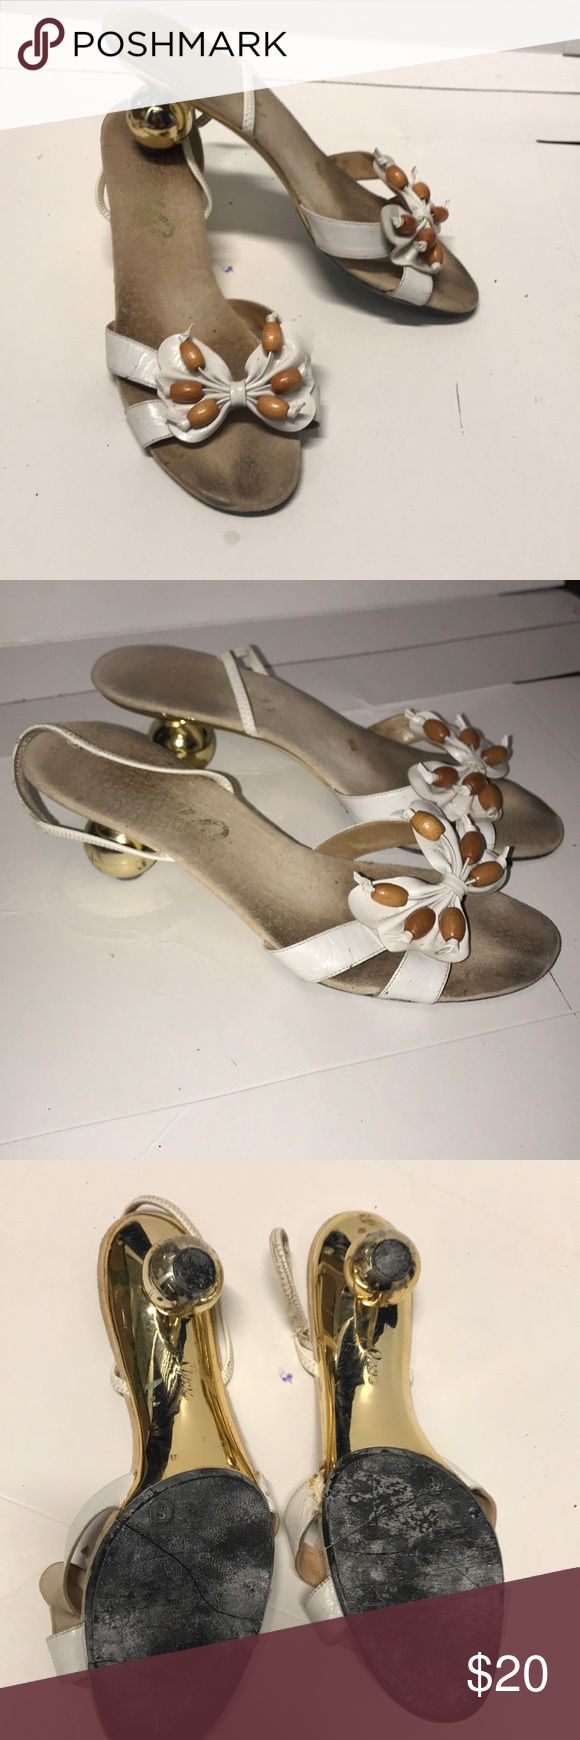 Unique heels Preloved priced accordingly  Onex size 8 Onex Shoes Heels